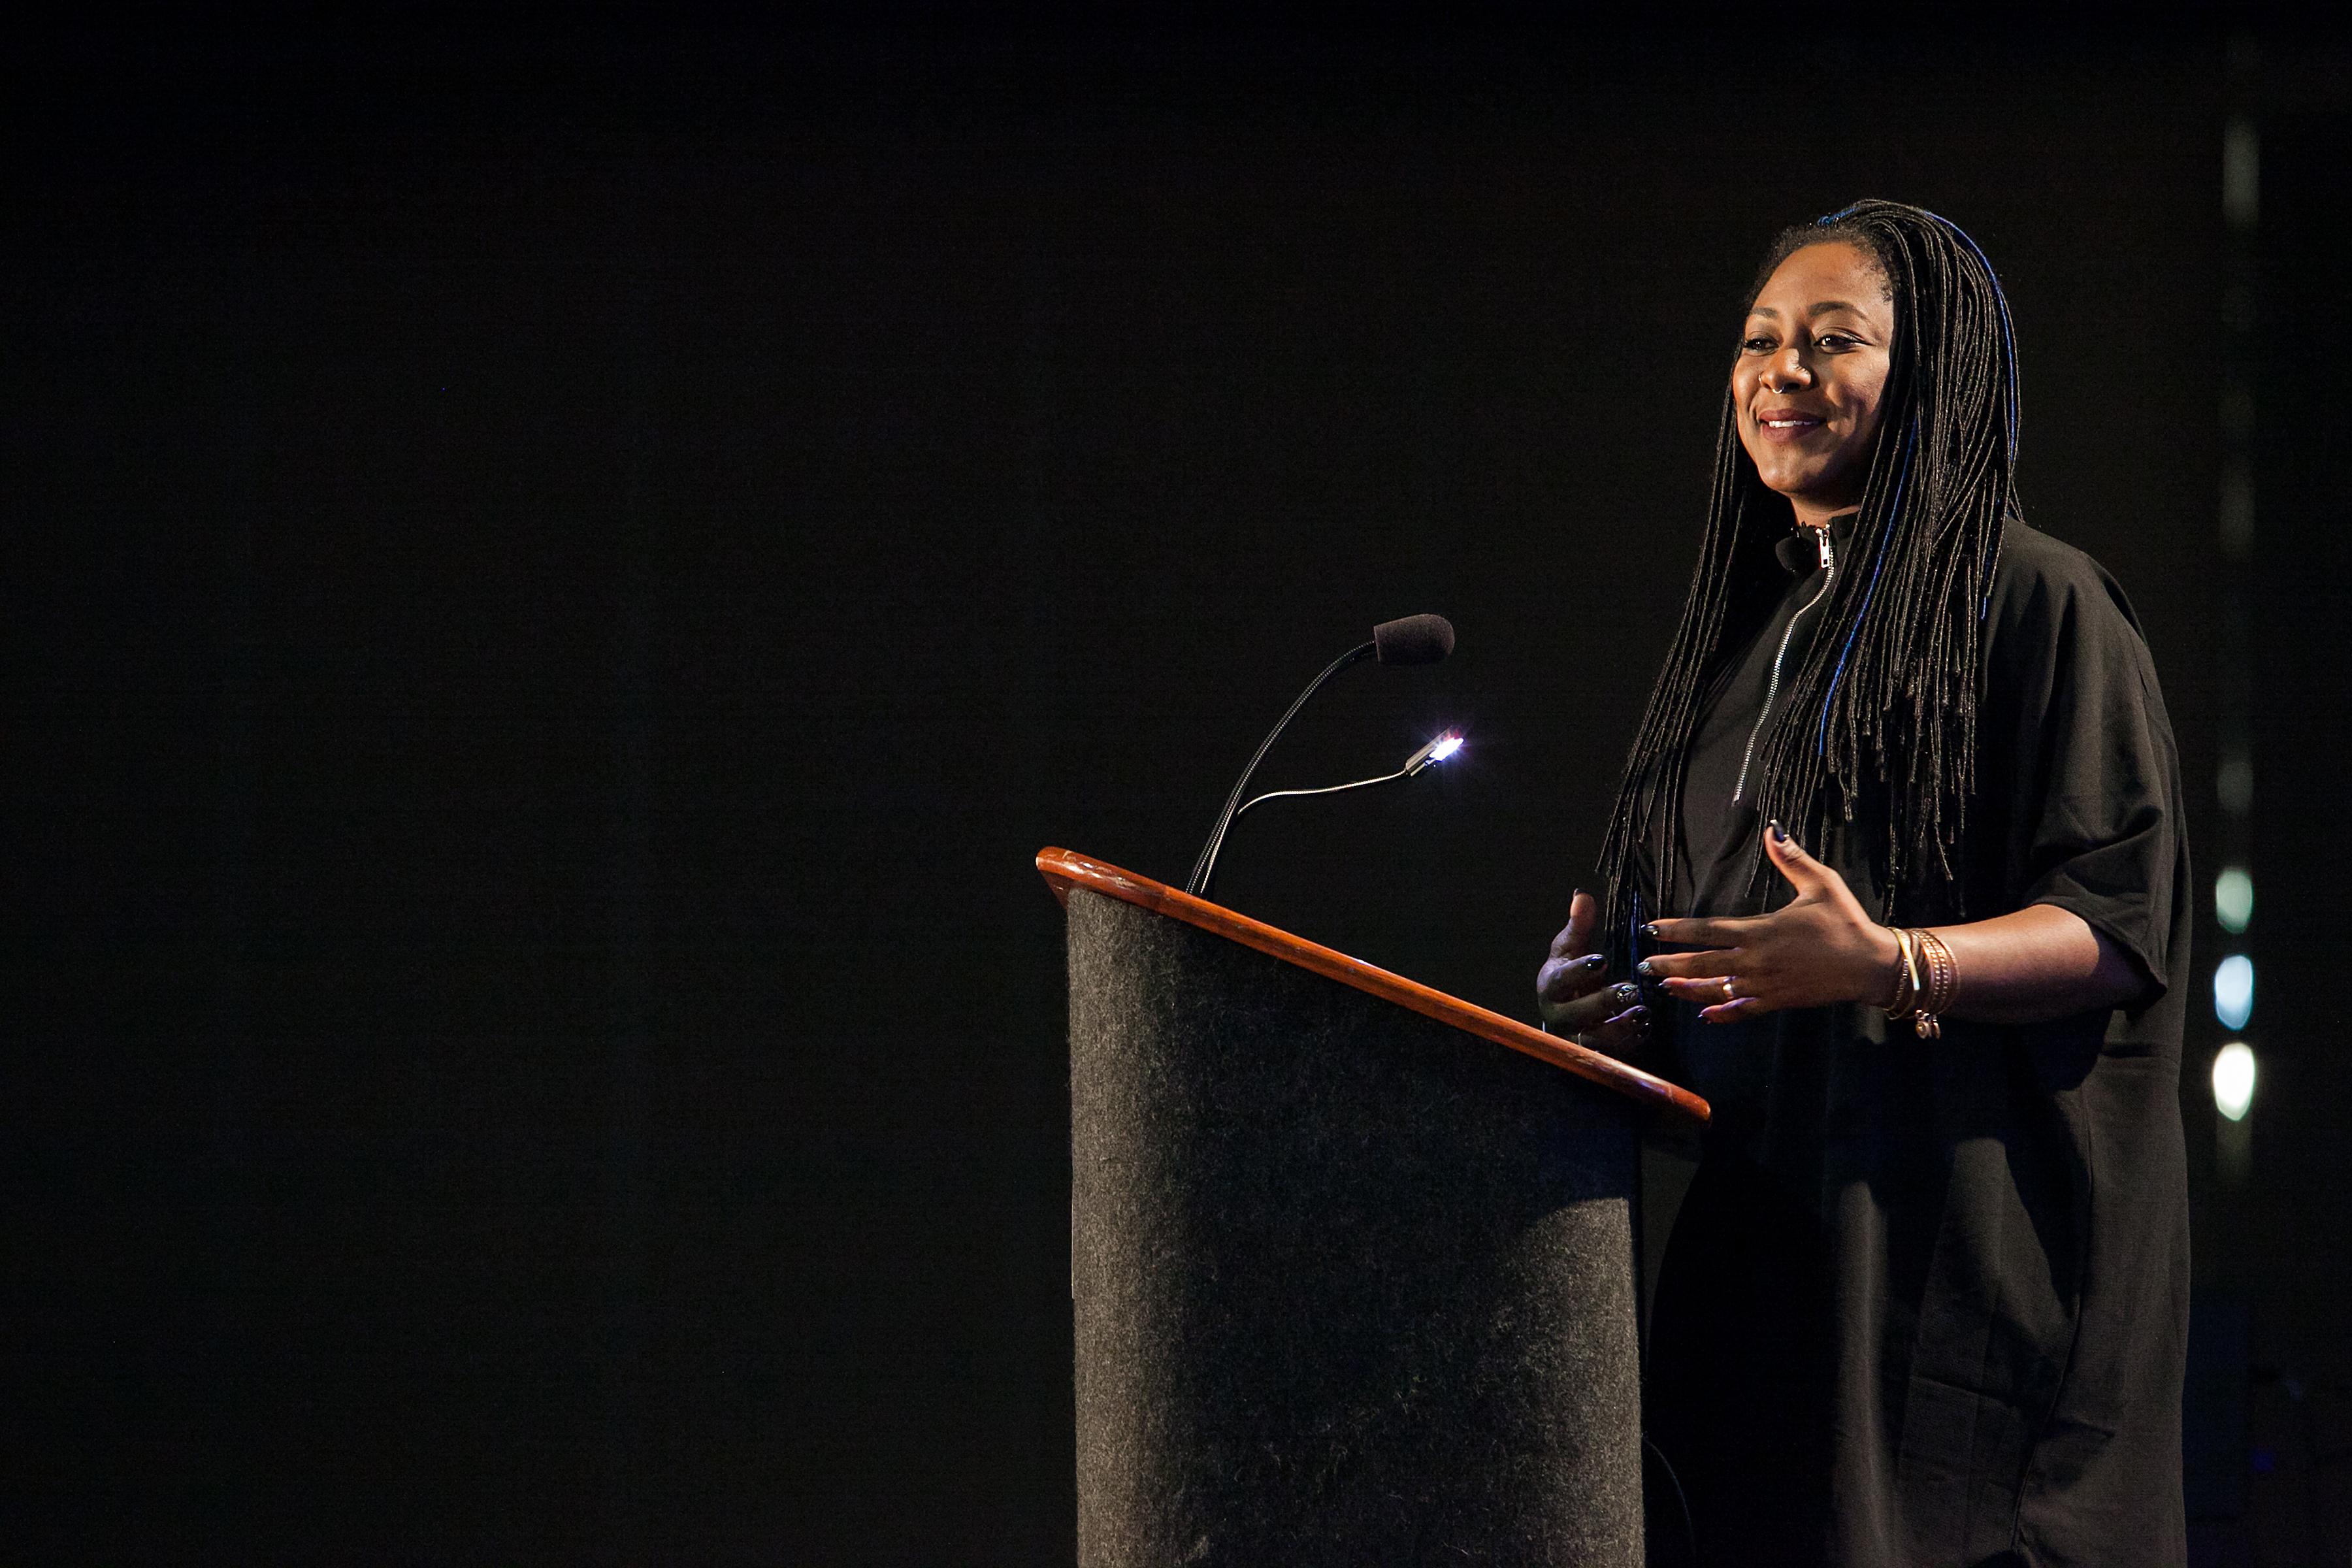 Alicia Garza speaks at NI16